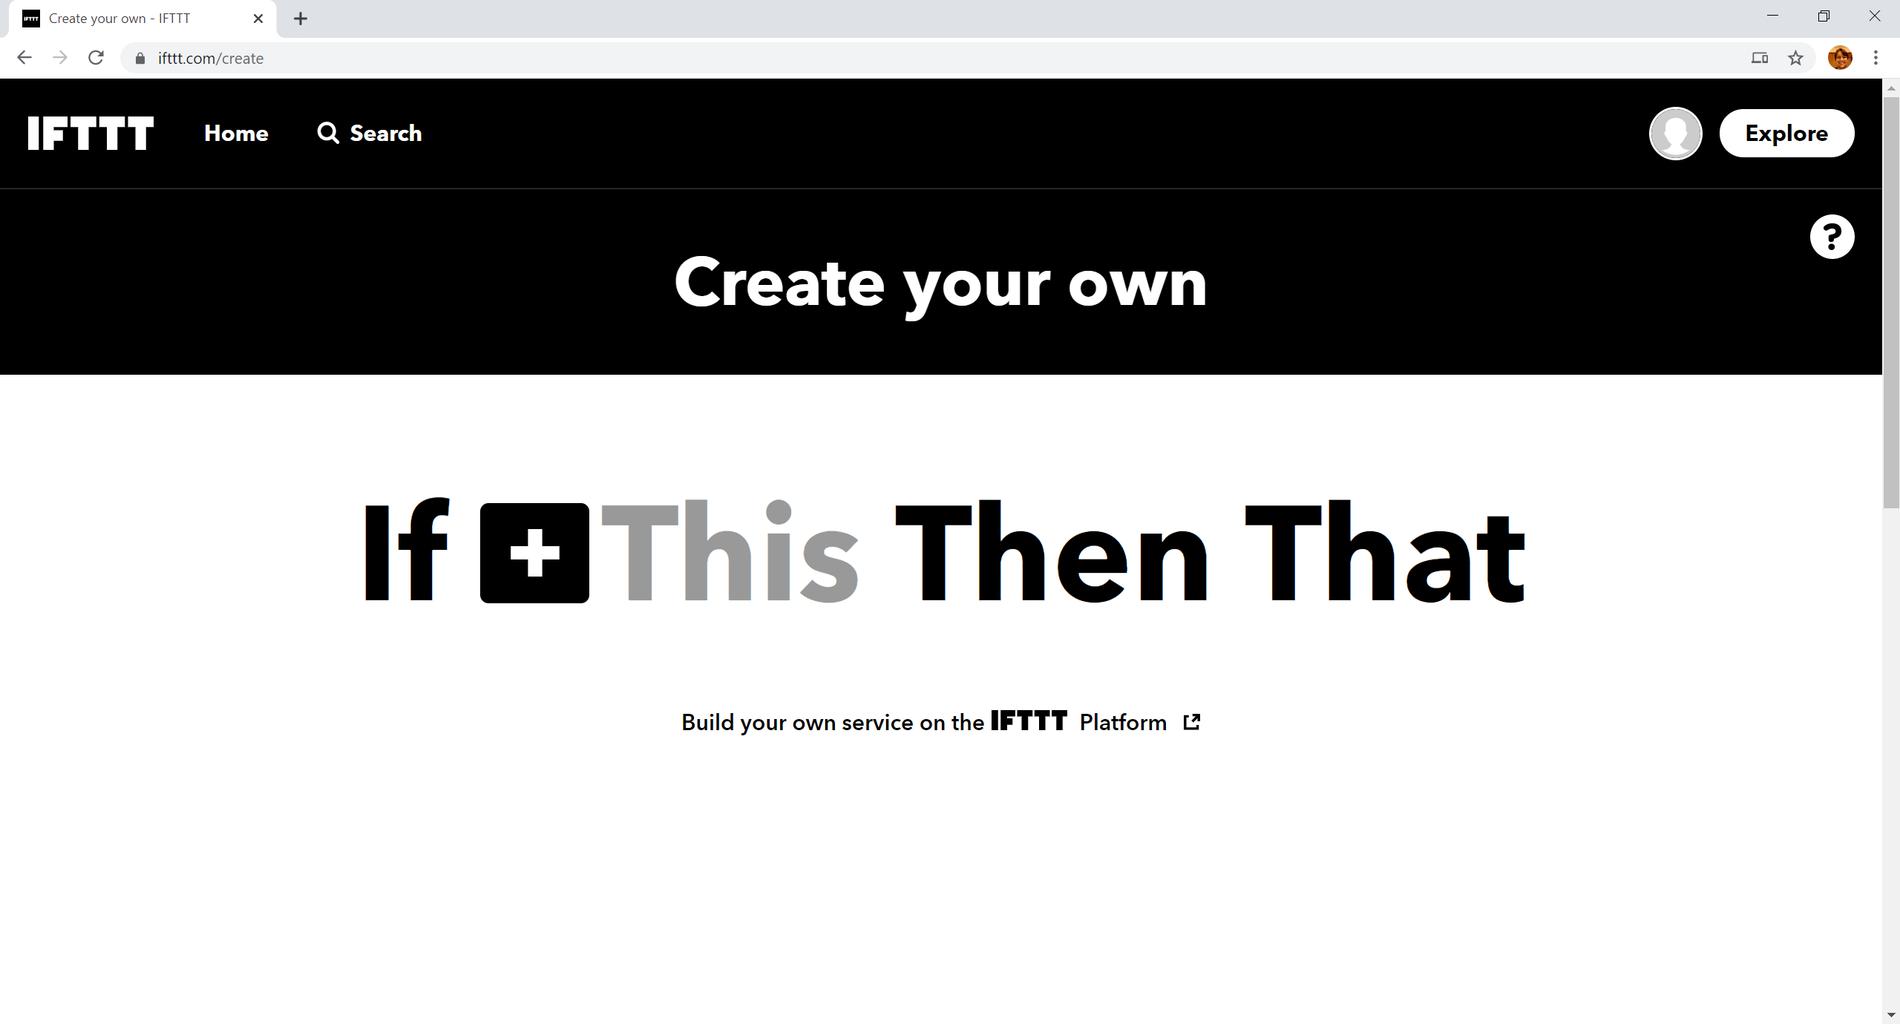 IFTTT Configuration